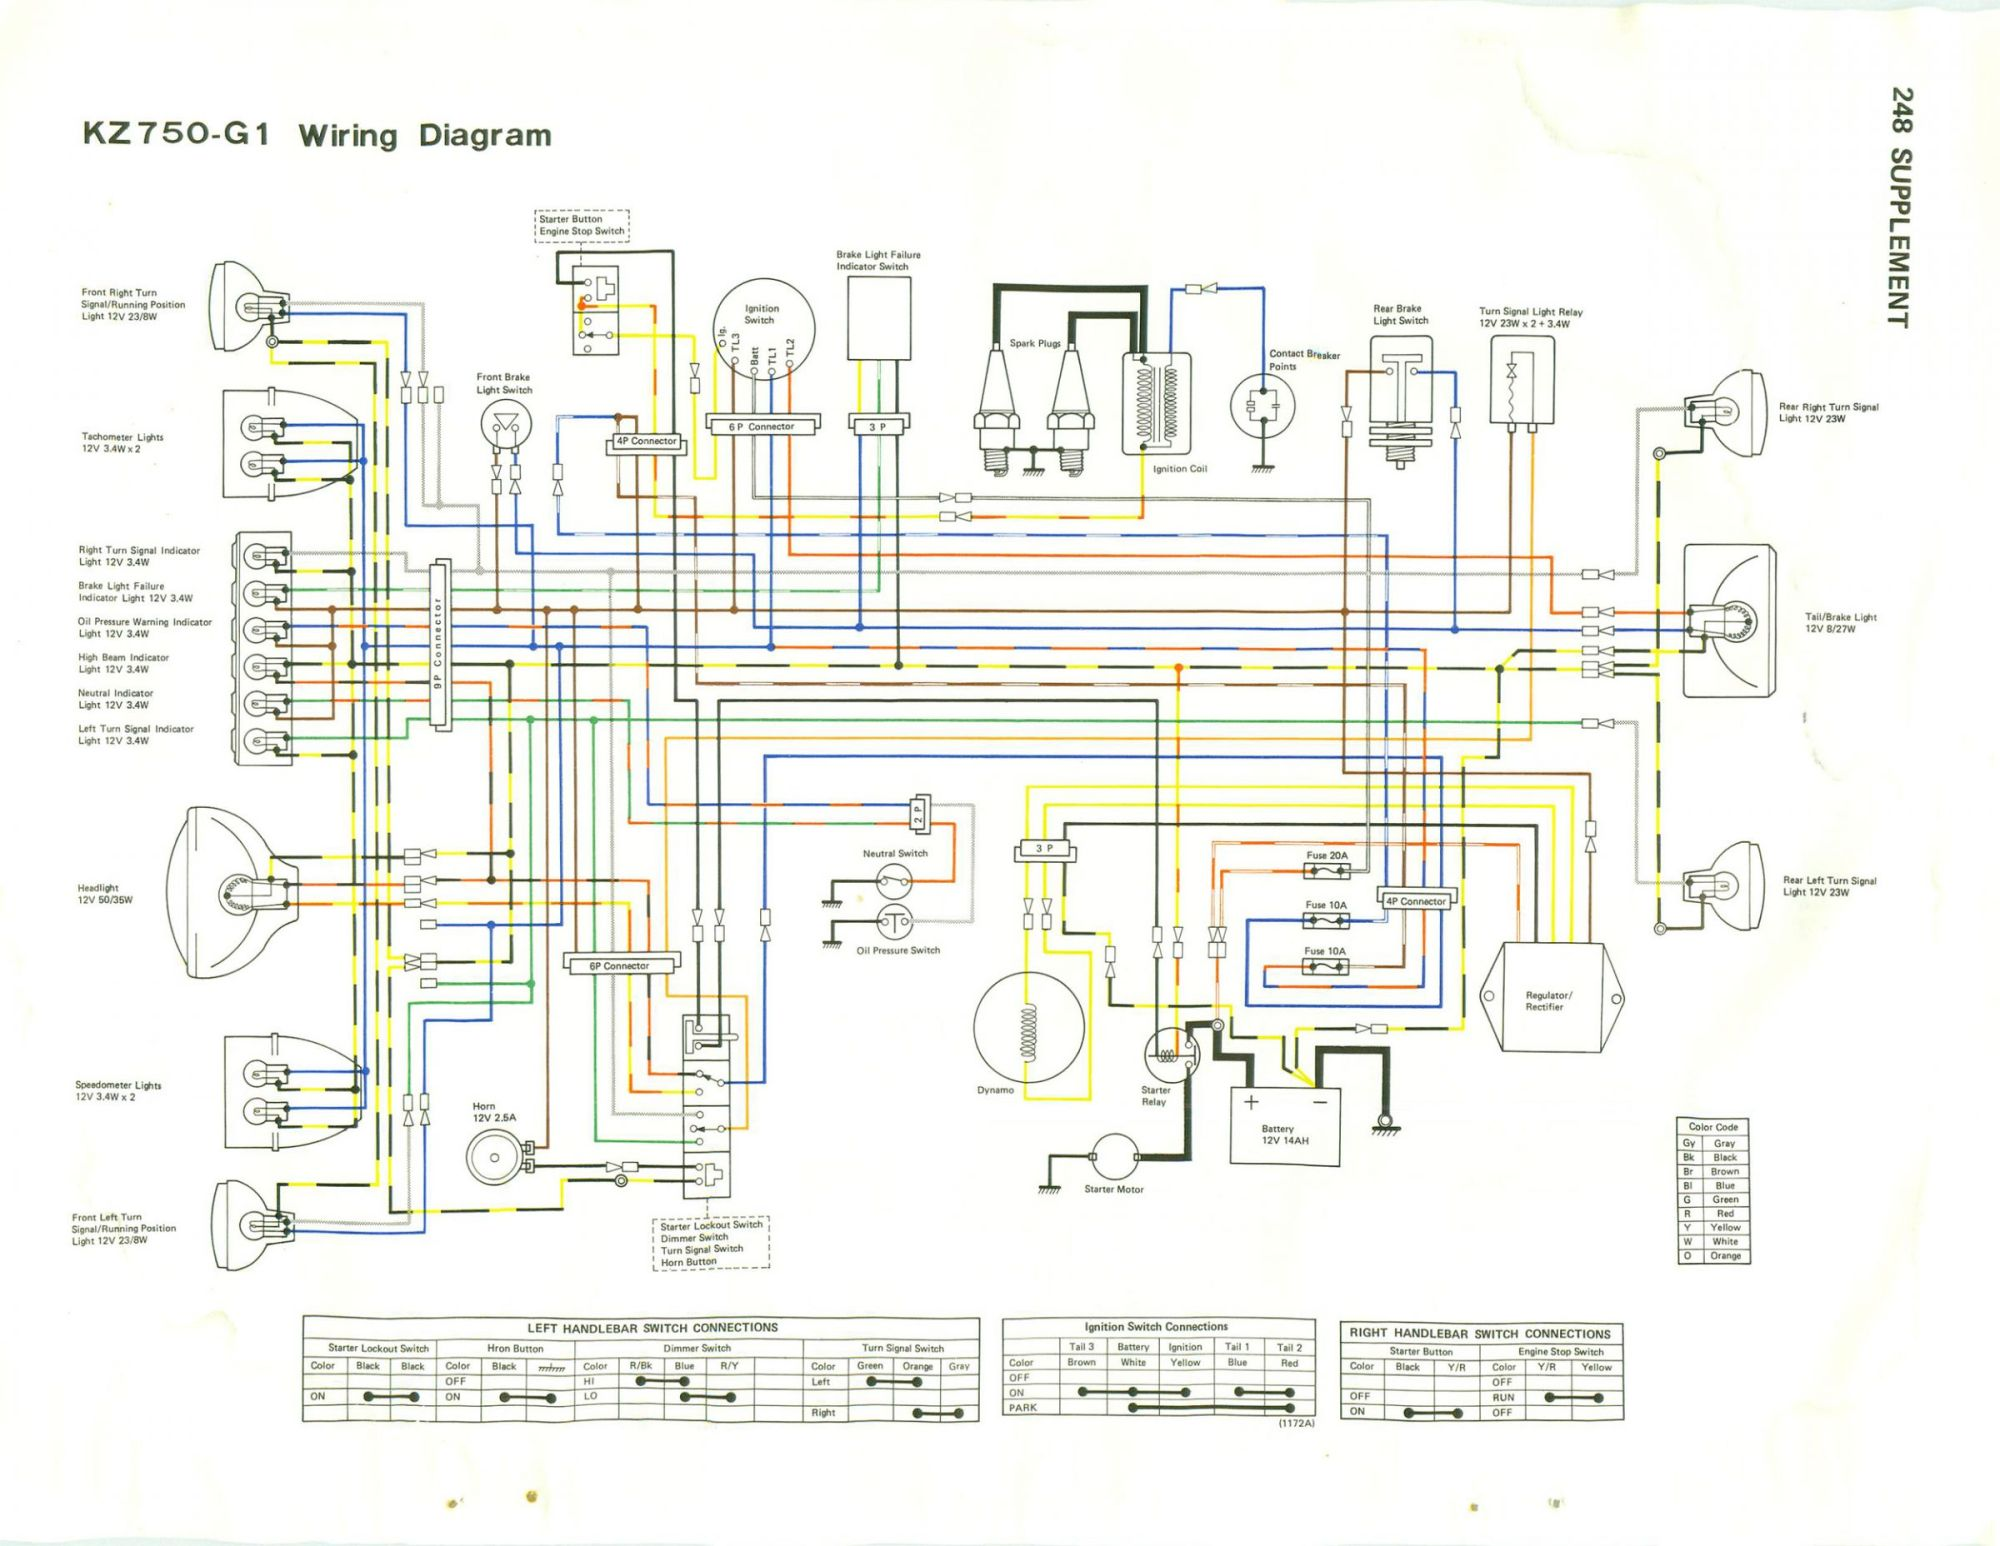 NE_8324] Kawasaki 750 Sts Jet Ski Wiring Diagram Download DiagramOxyl Ittab Olyti Joami Sand Chim Oxyl Targ Phae Ariot Verr Vira  Mohammedshrine Librar Wiring 101